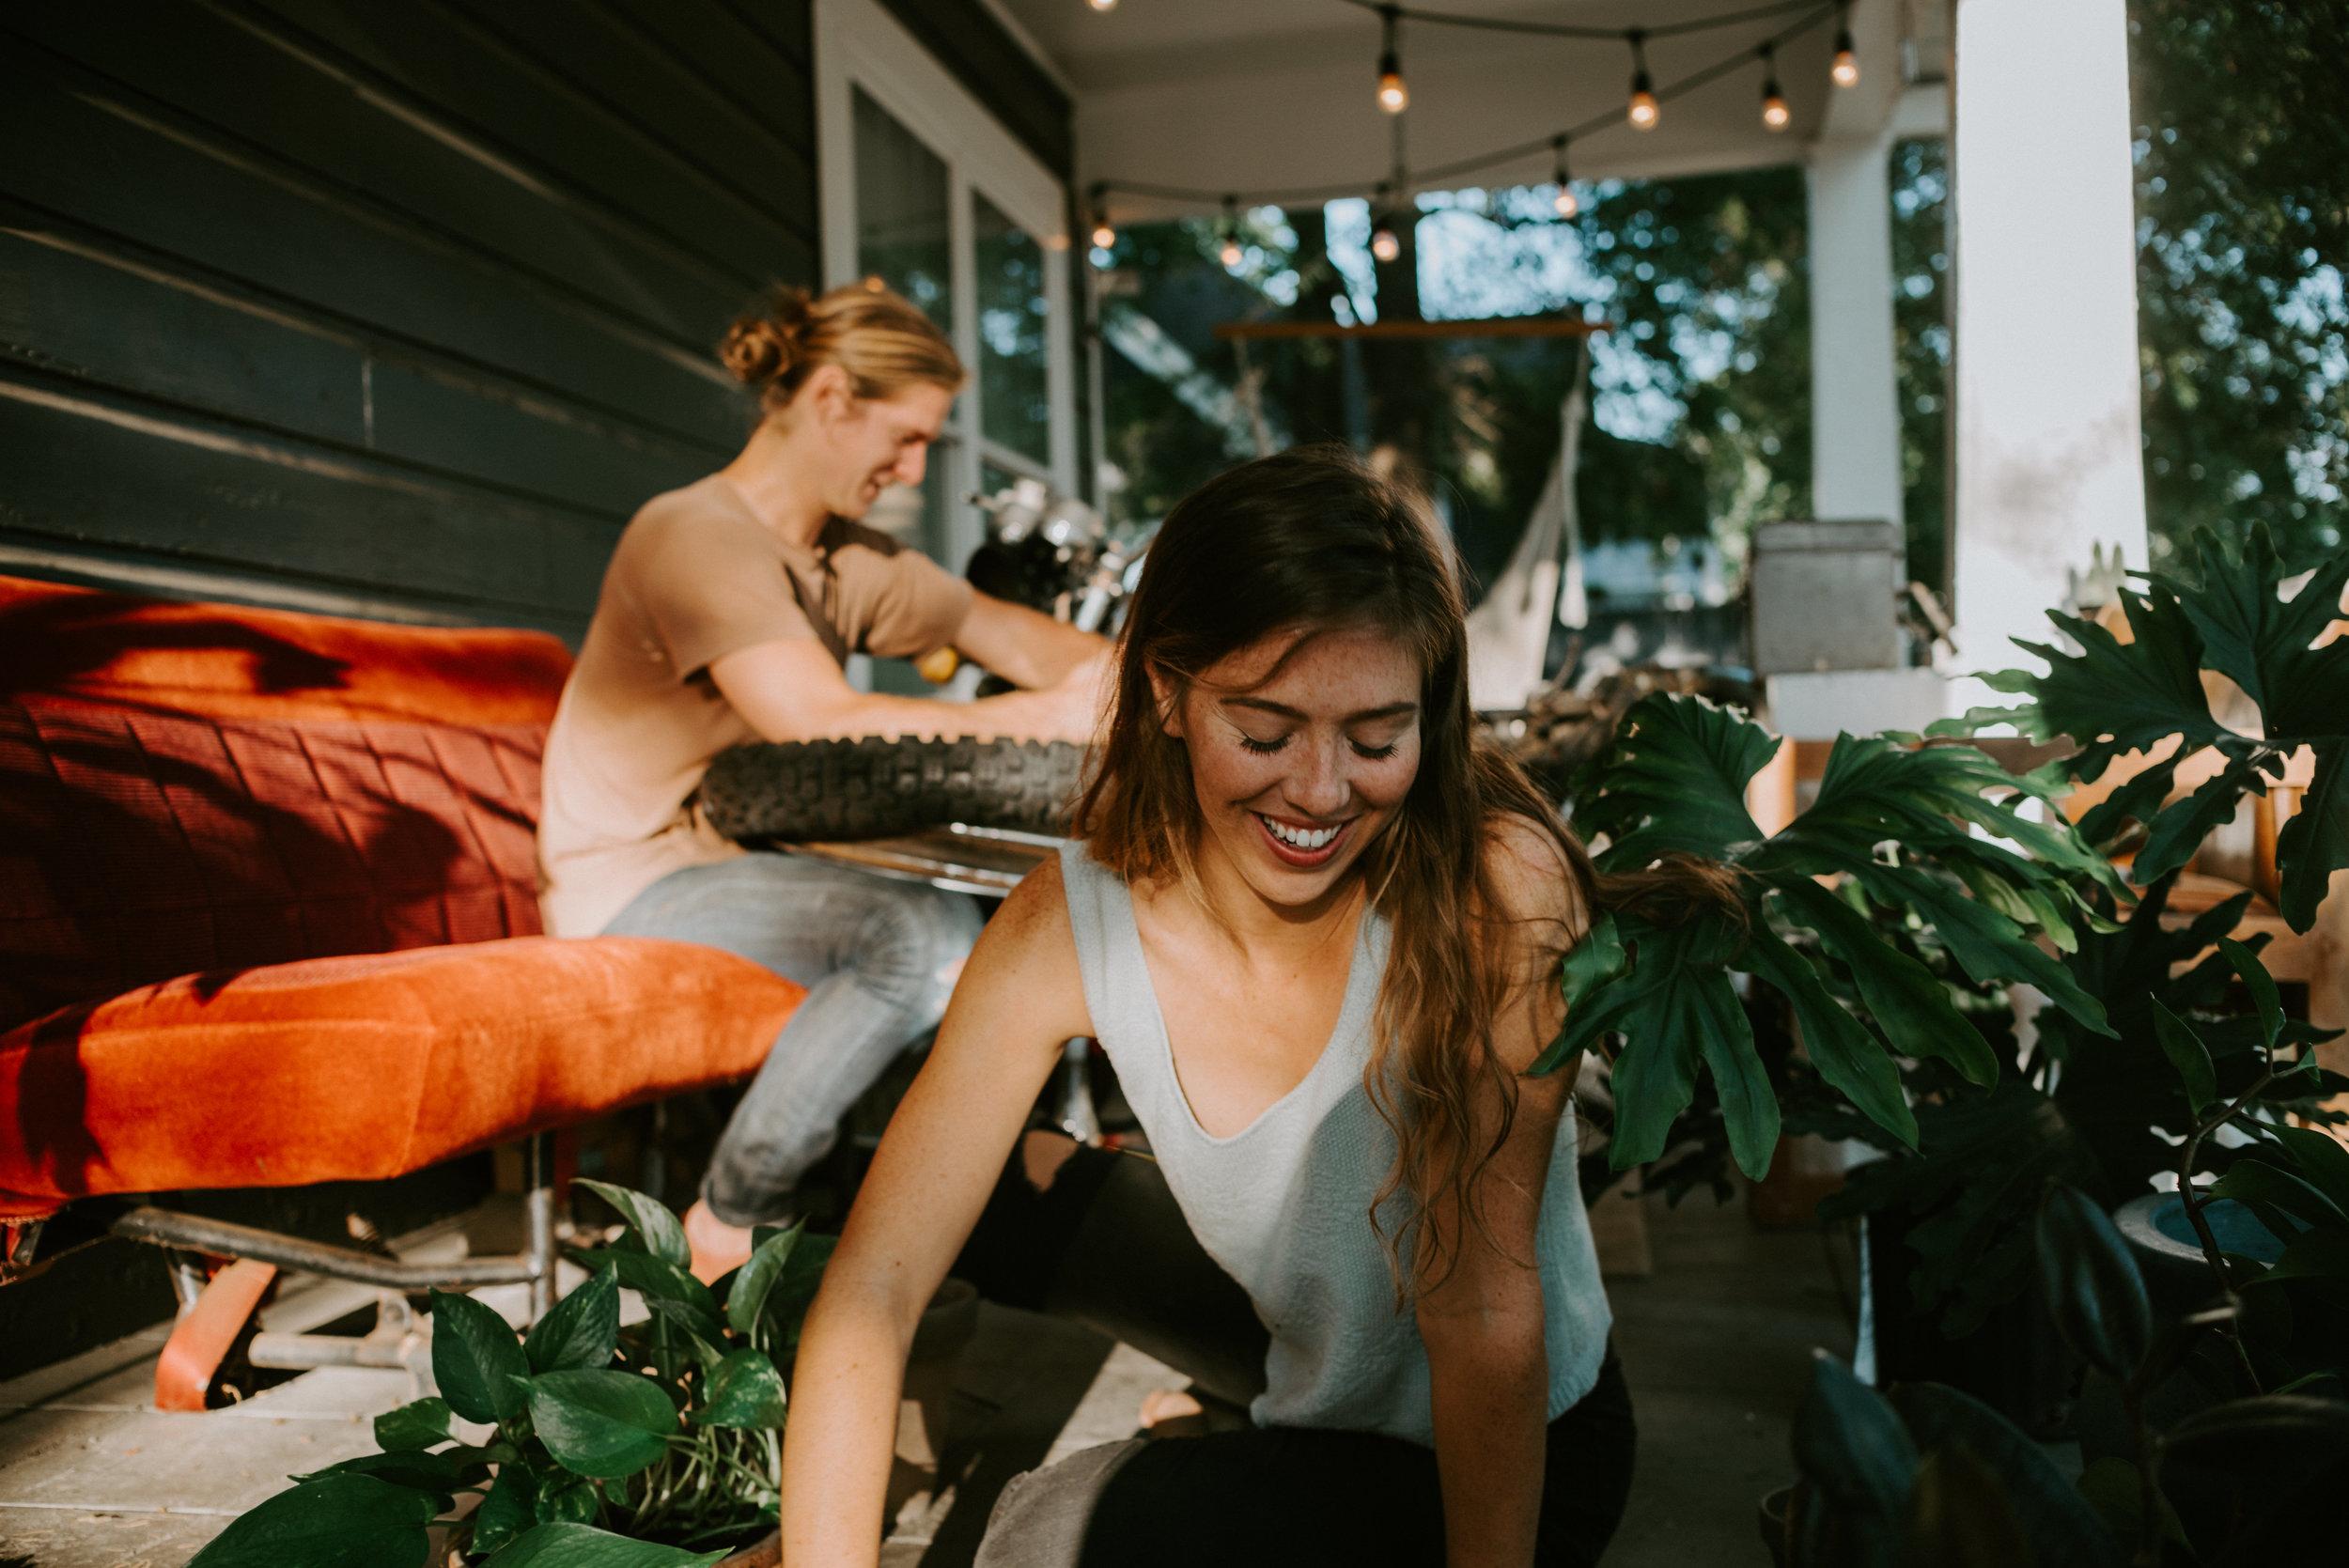 WonderlyCreative_Couples_7.9.18_Cameron&Alexis_-23.jpg